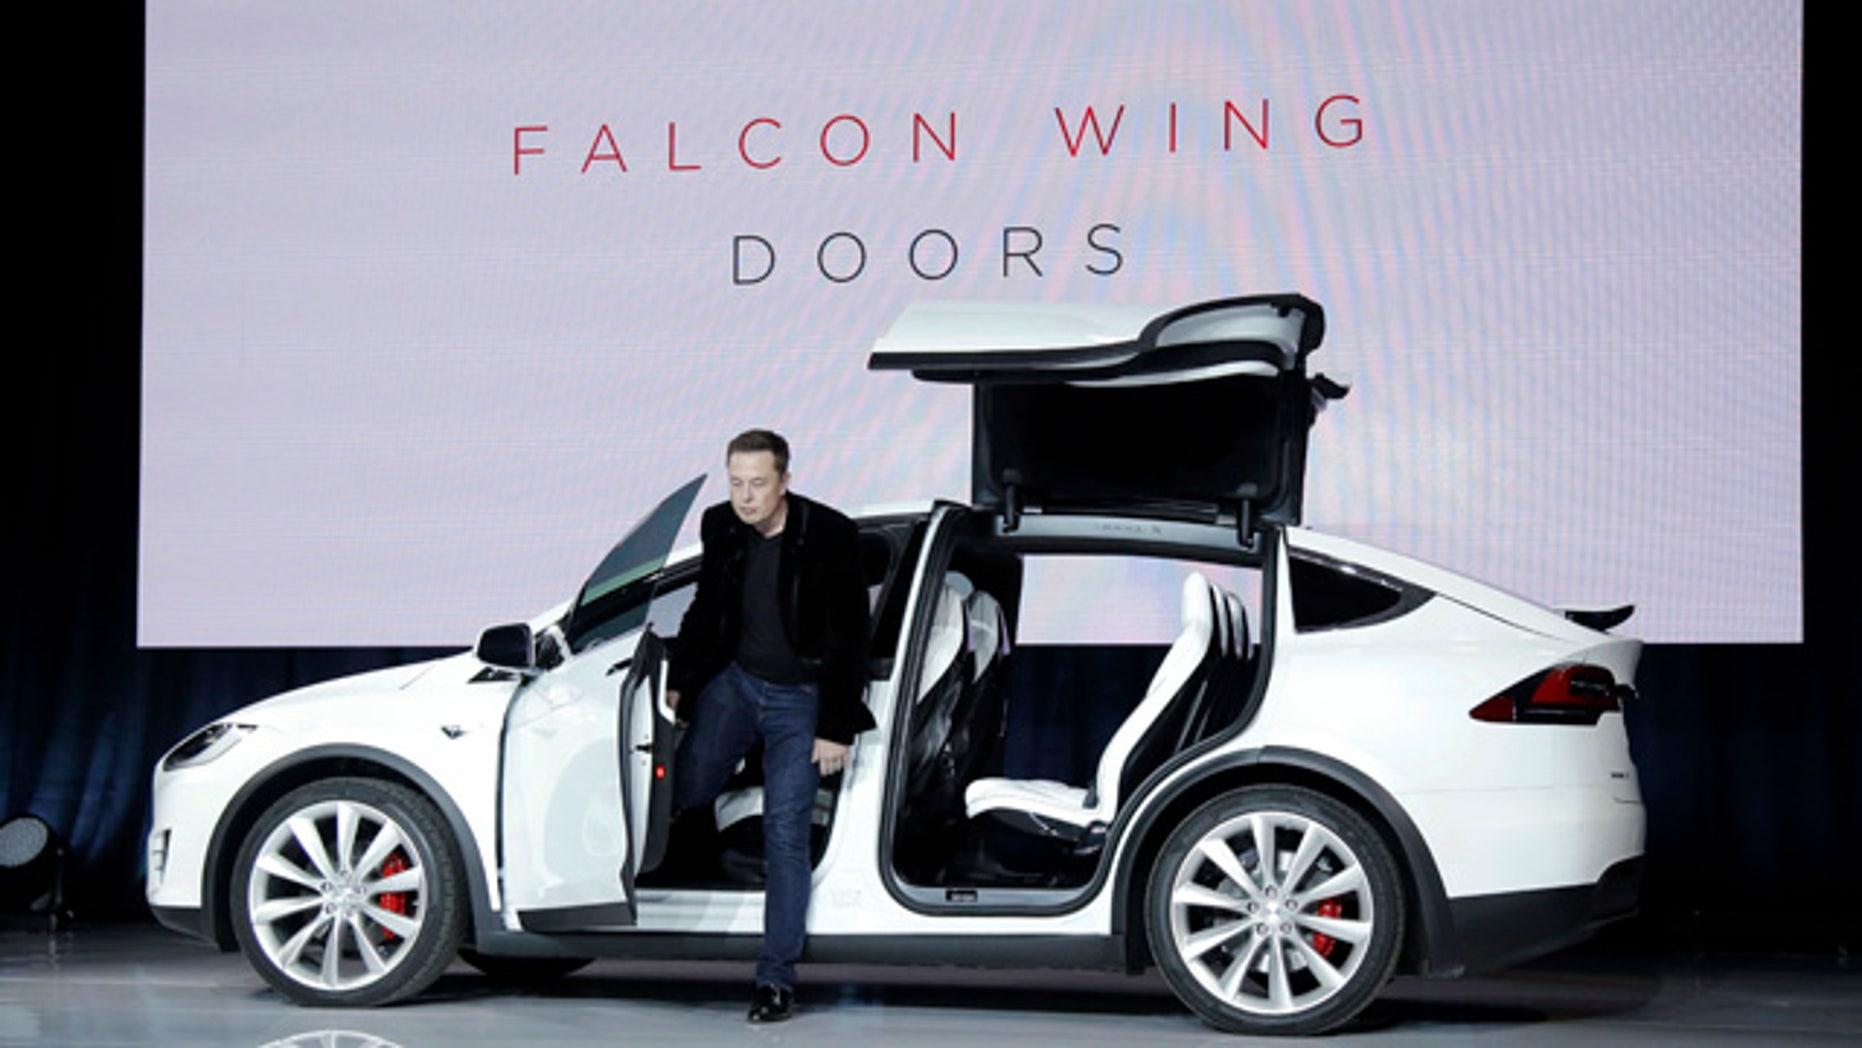 Sept. 29, 2015: Elon Musk, CEO of Tesla Motors Inc., introduces the Model X car at the company's headquarters in Fremont, Calif. (AP Photo/Marcio Jose Sanchez)